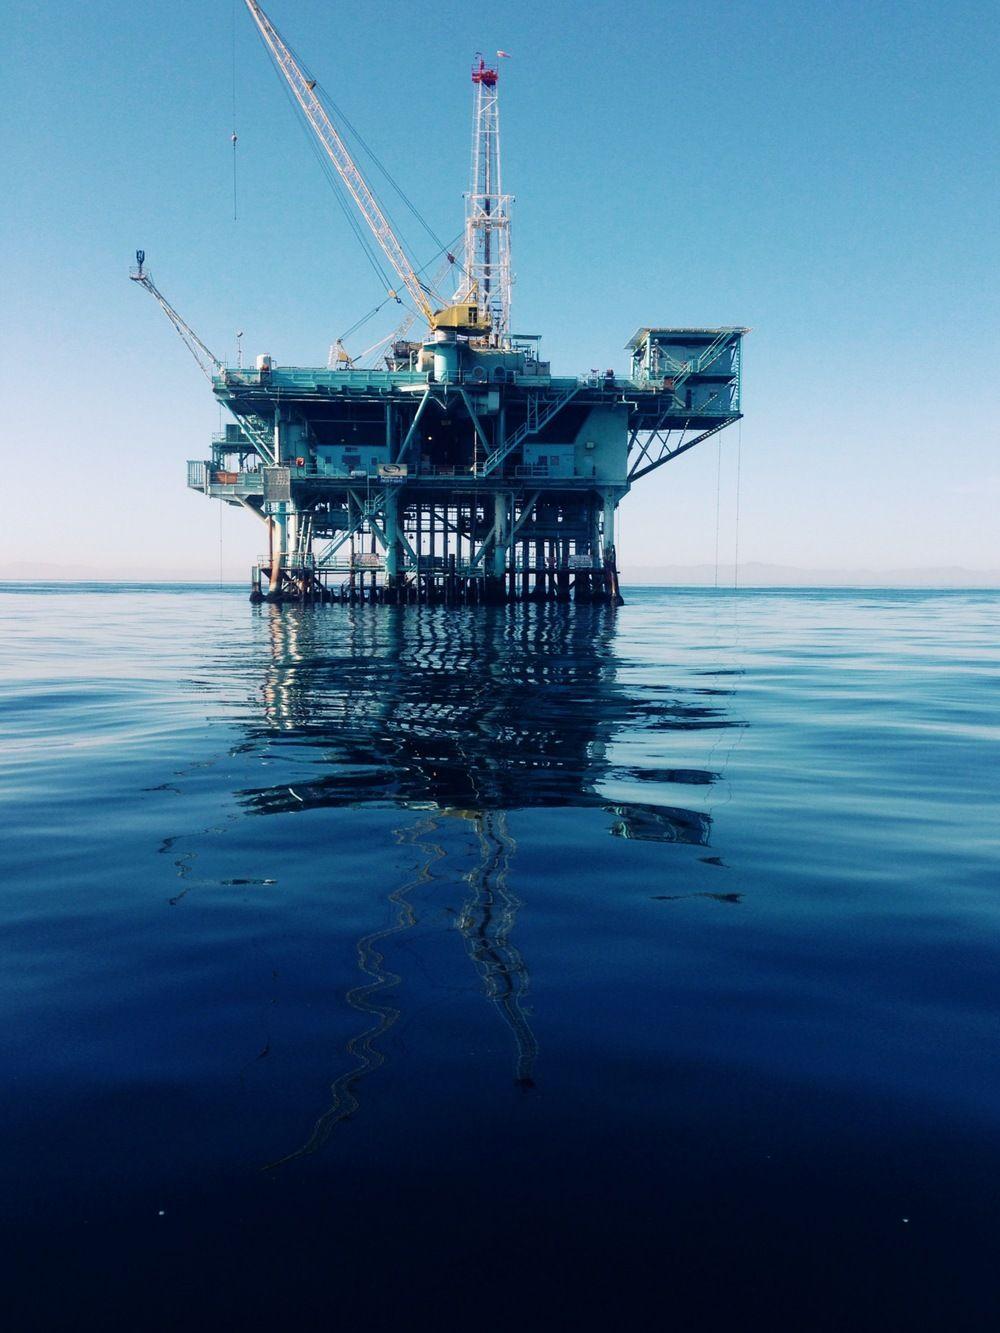 California — RigstoReefs Oil platform, Oil rig, Oil